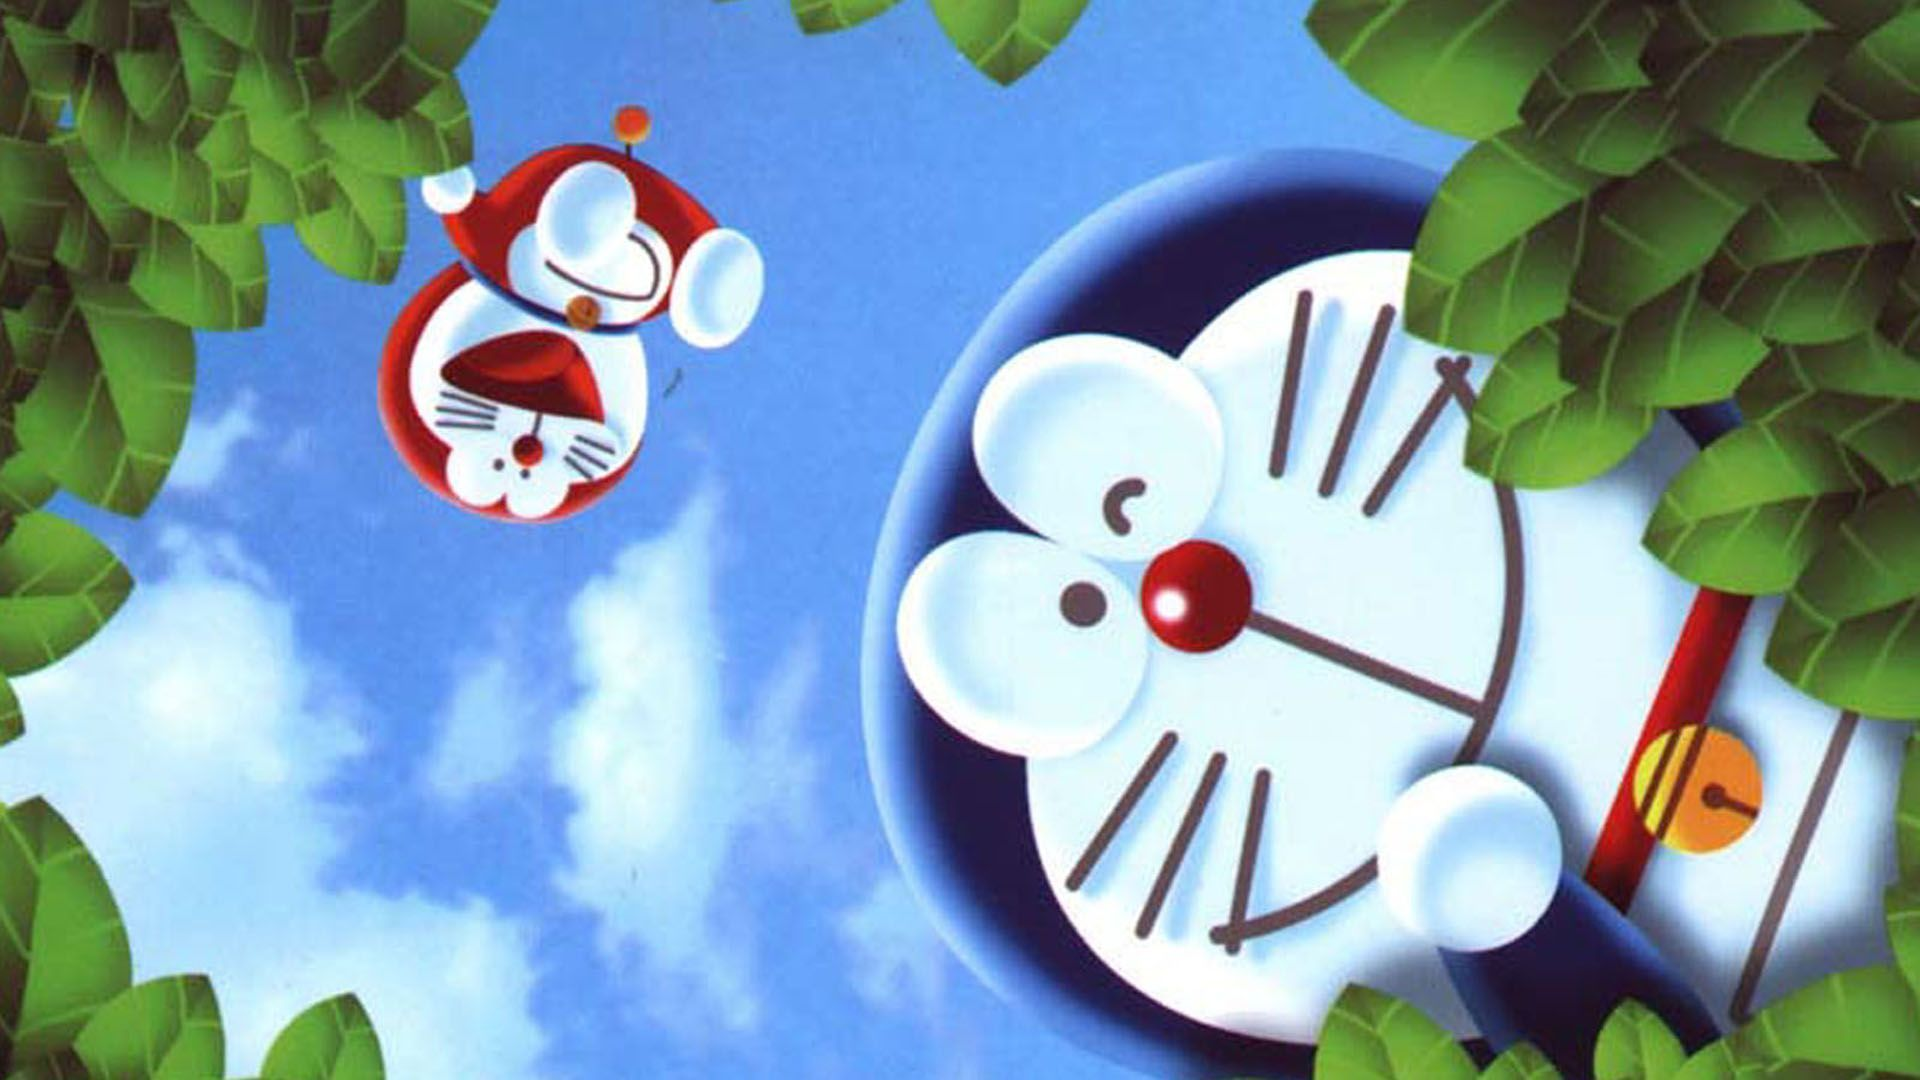 Doraemon wallpaper hd wallpapers pinterest wallpaper doraemon wallpaper voltagebd Images